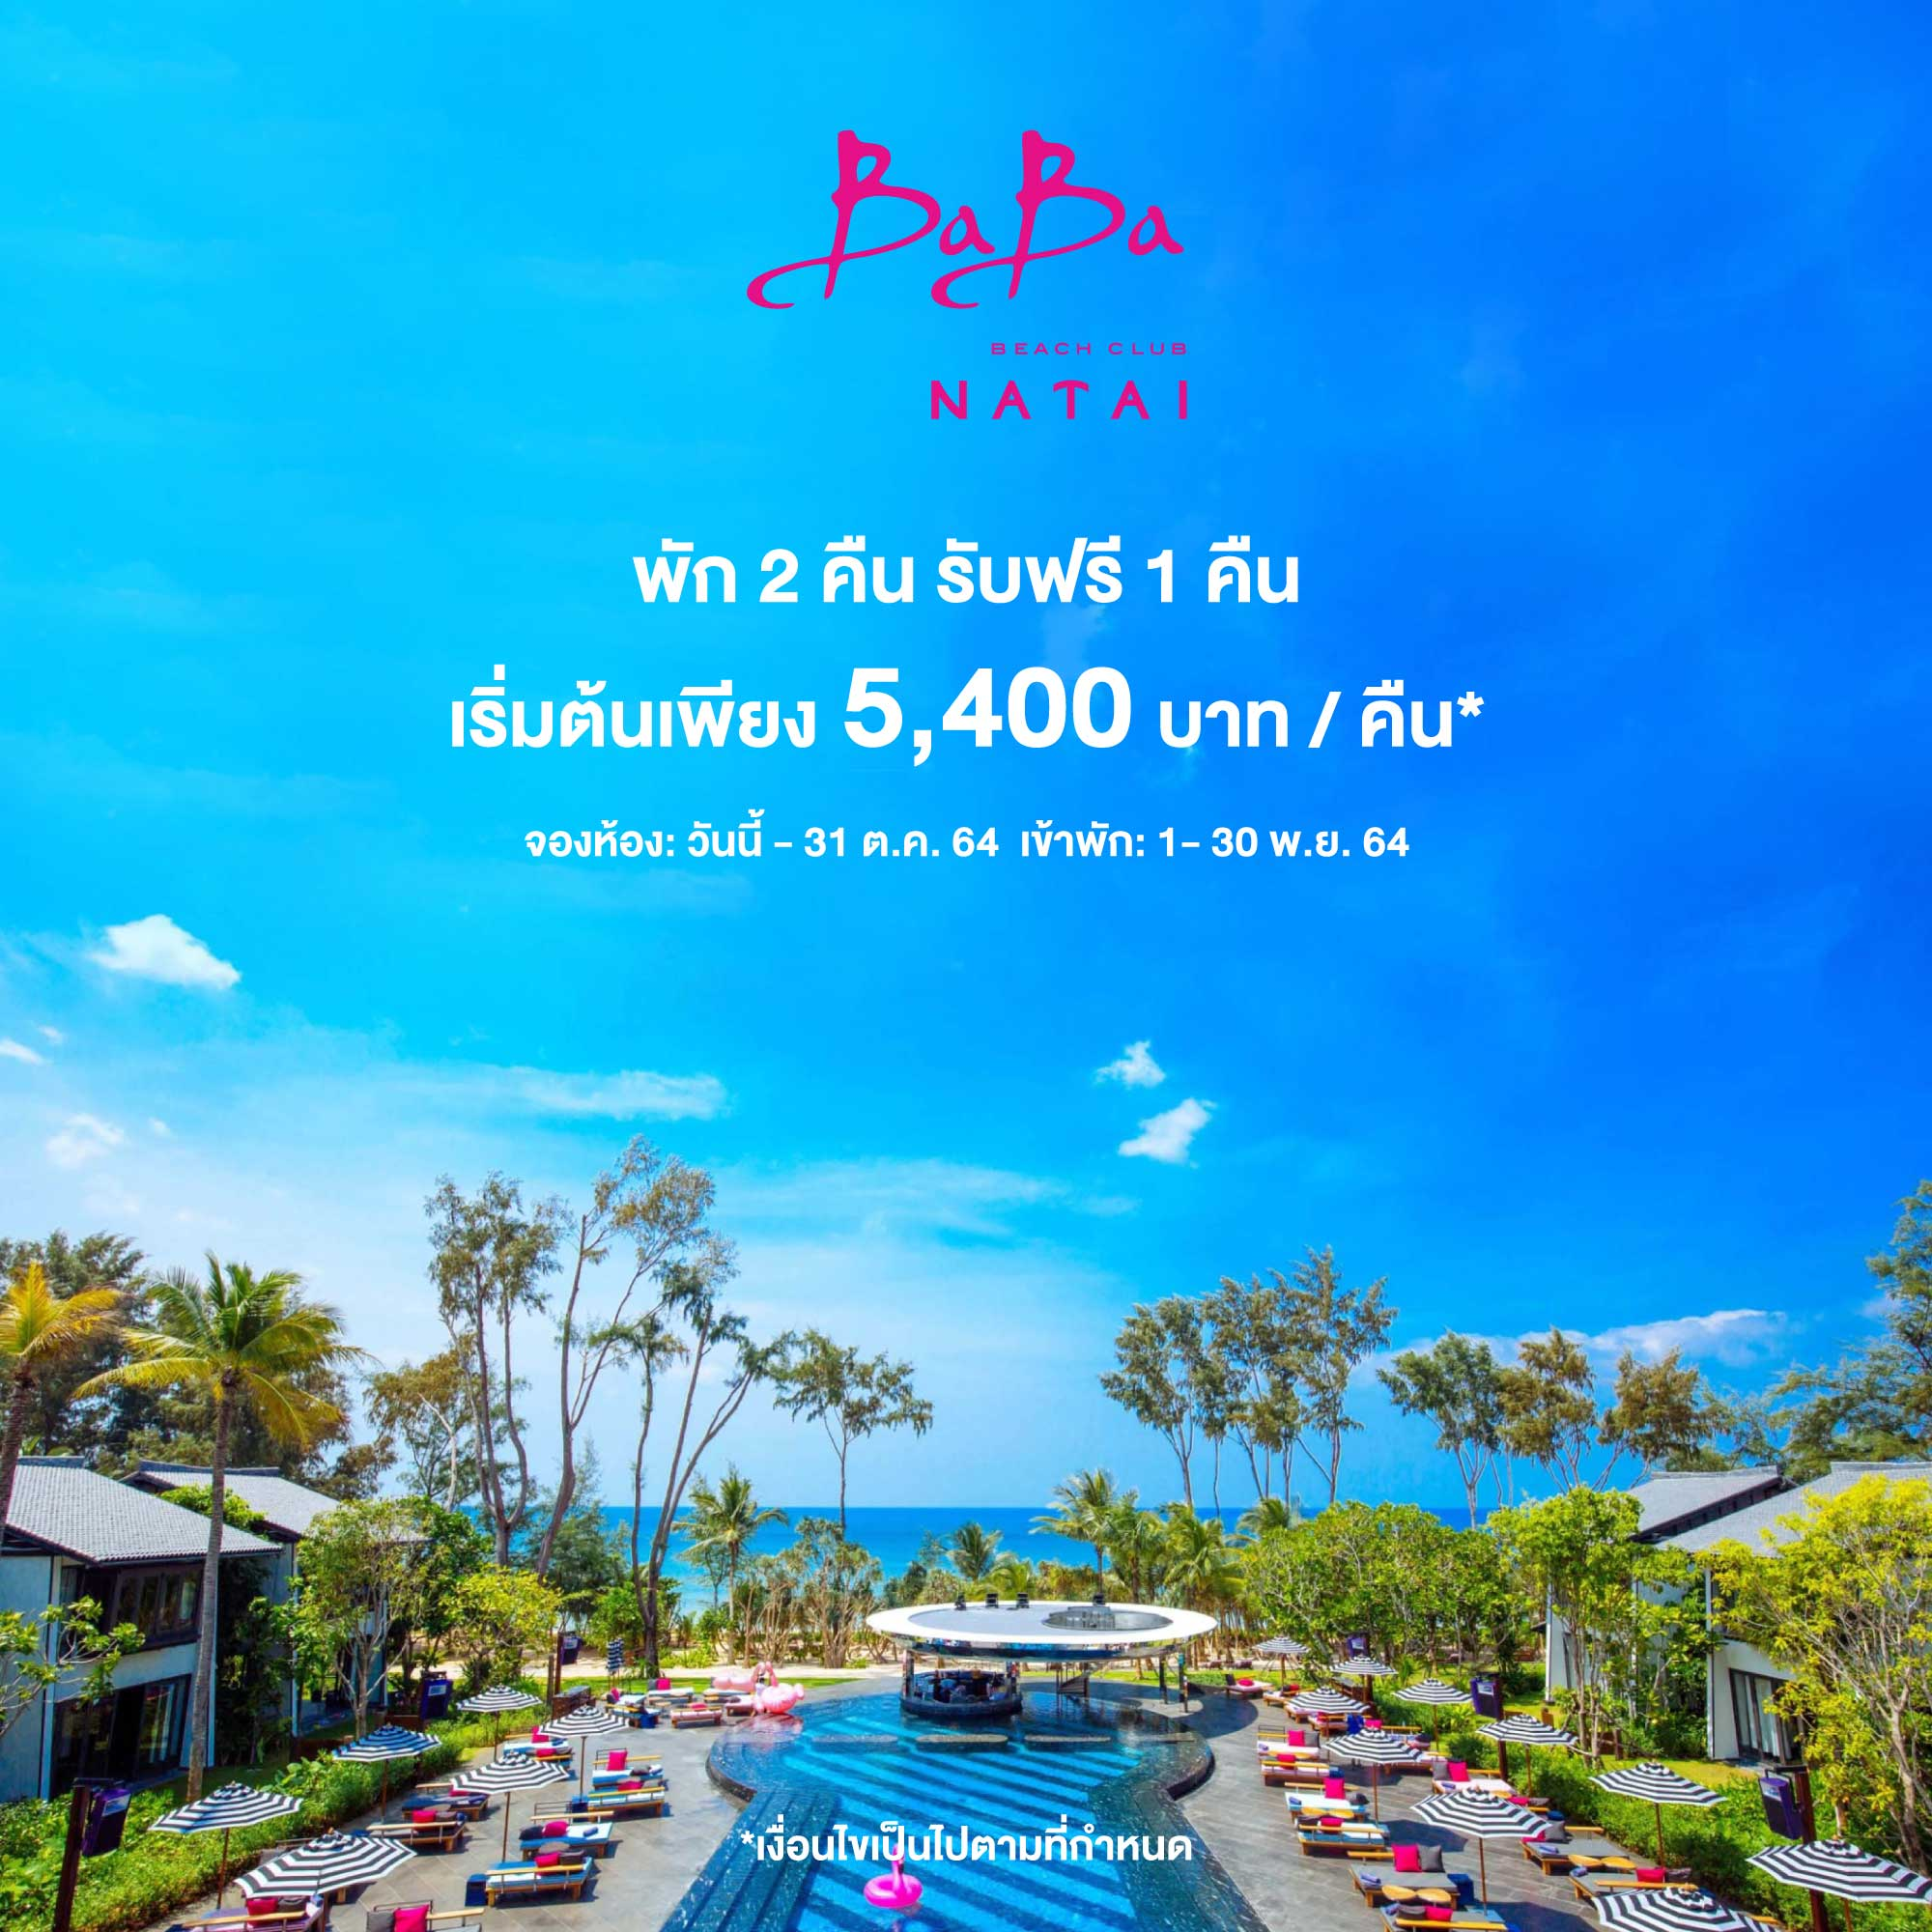 promotion-baba-beach-club-natai-privilege-book-direct-best-rate-guarantee